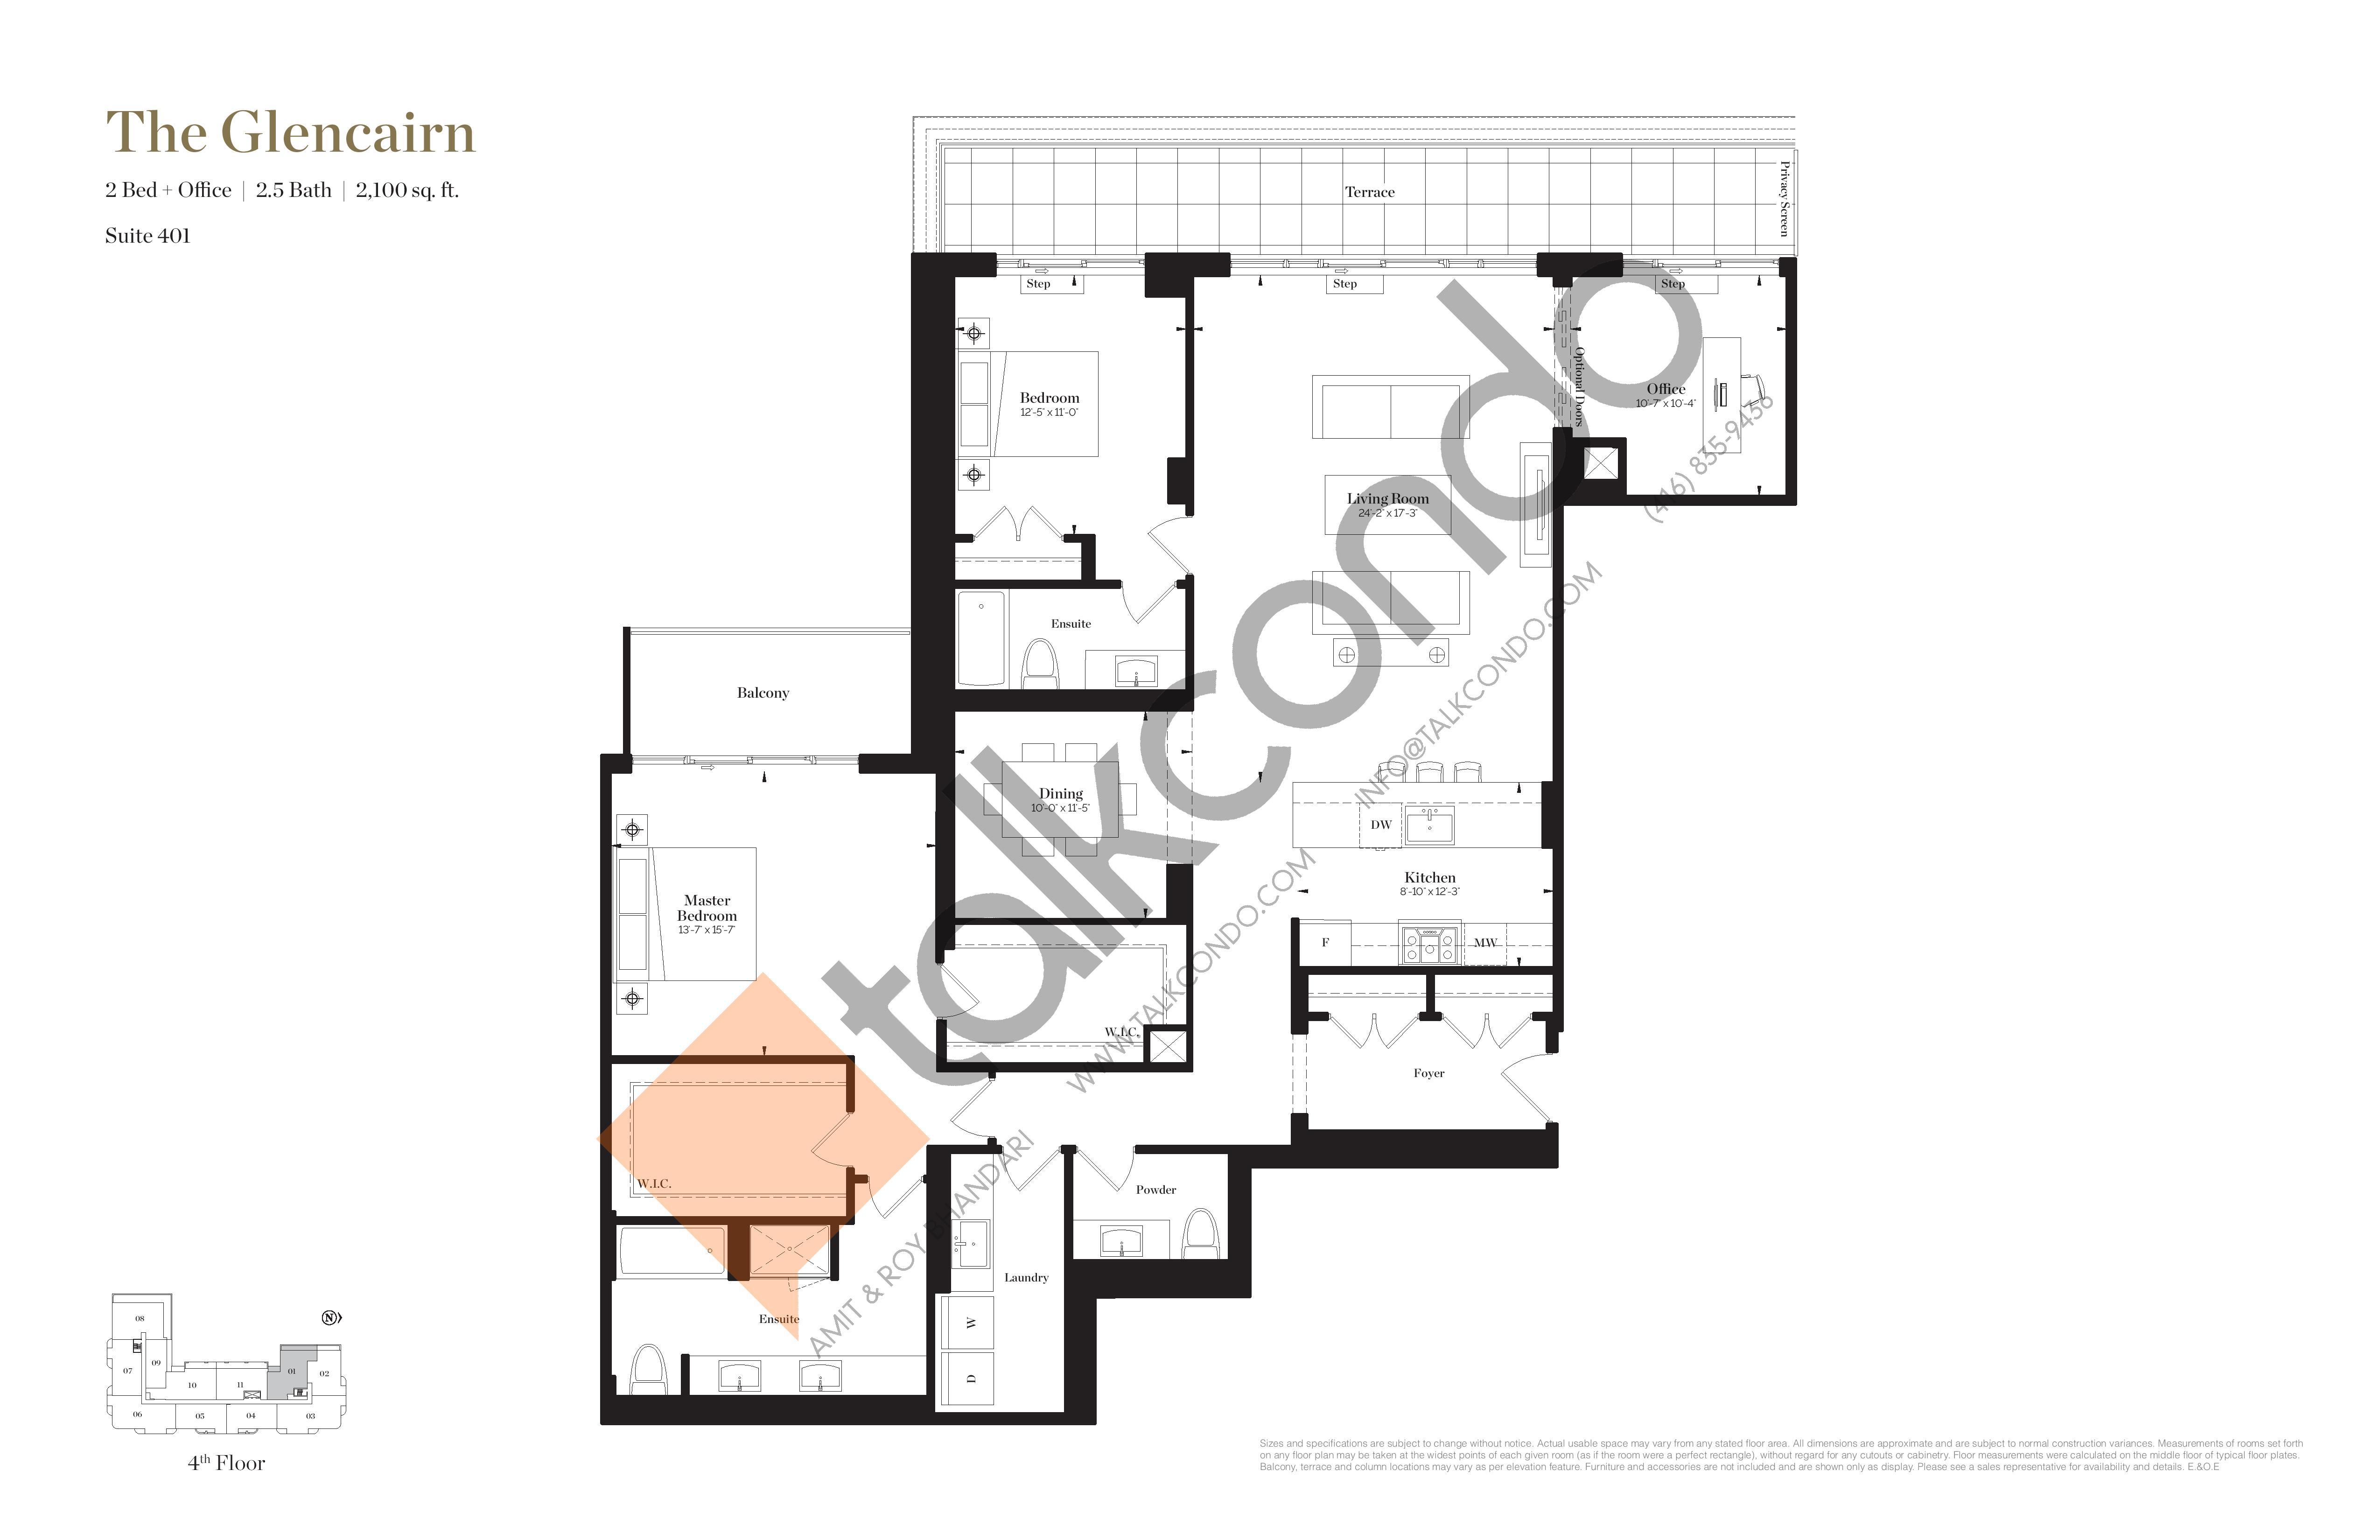 The Glencairn Floor Plan at Empire Maven Condos - 2100 sq.ft